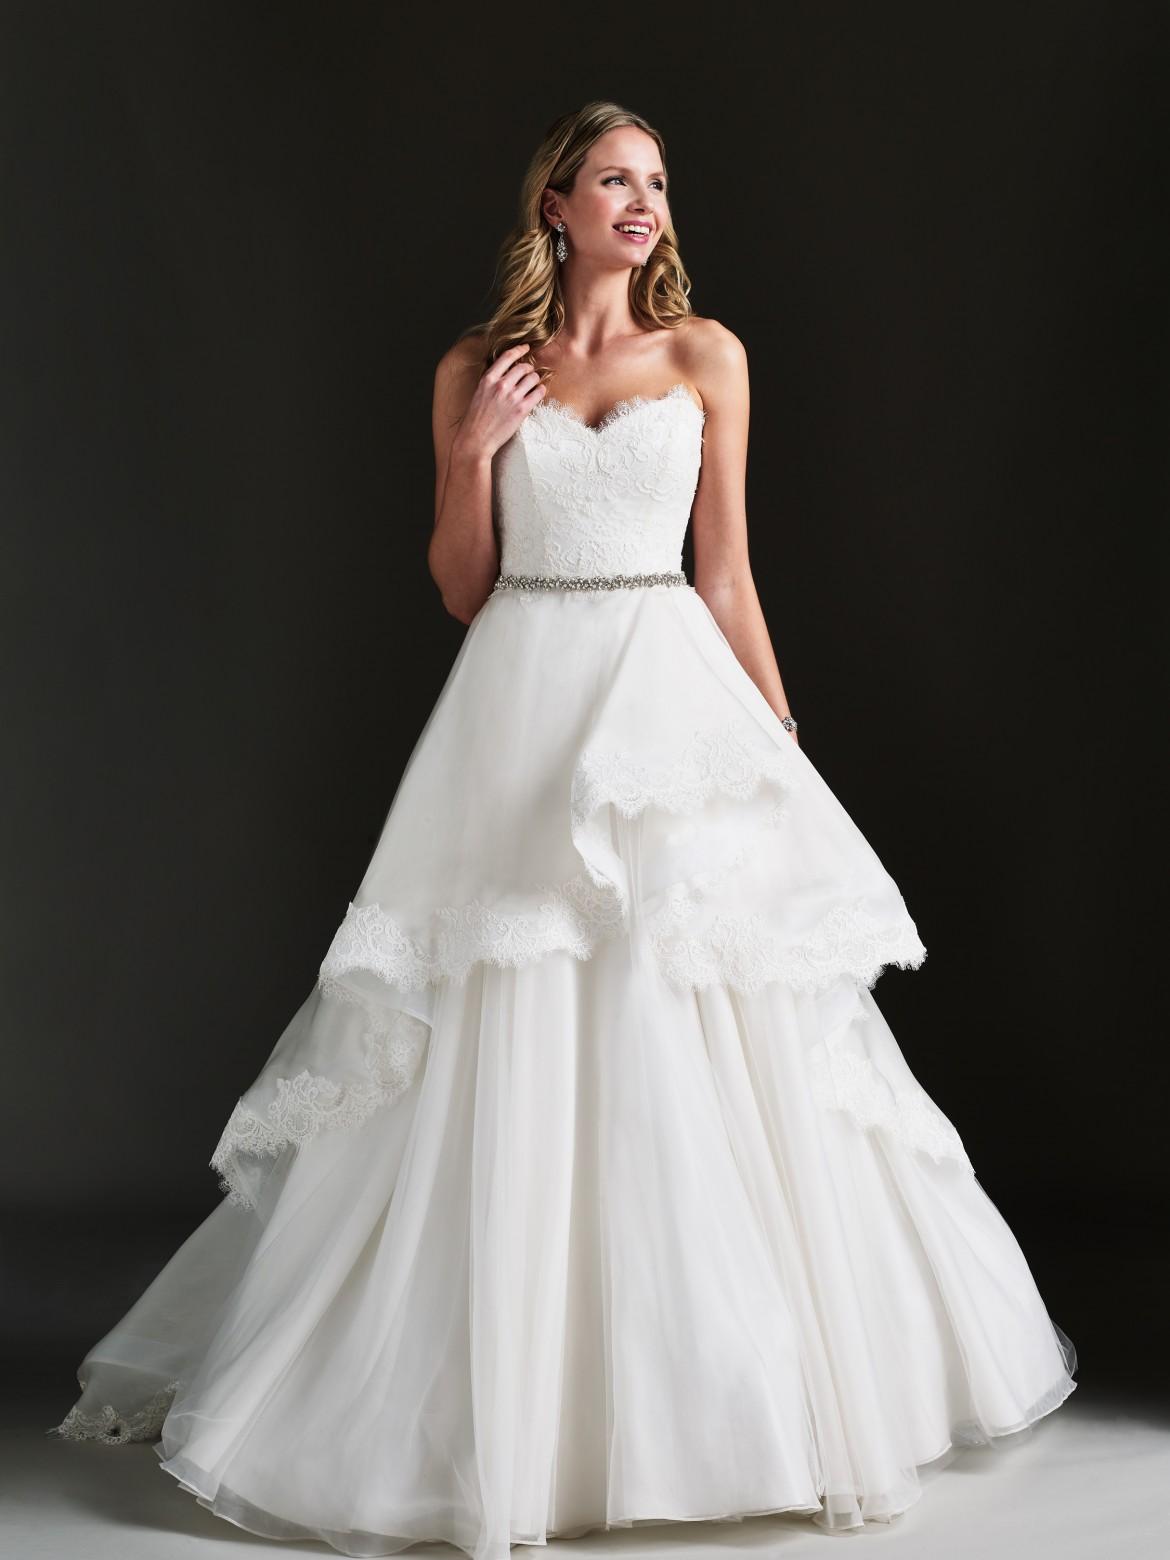 Wedding dress sample sale canada wedding dresses in redlands for Wedding dresses iowa city